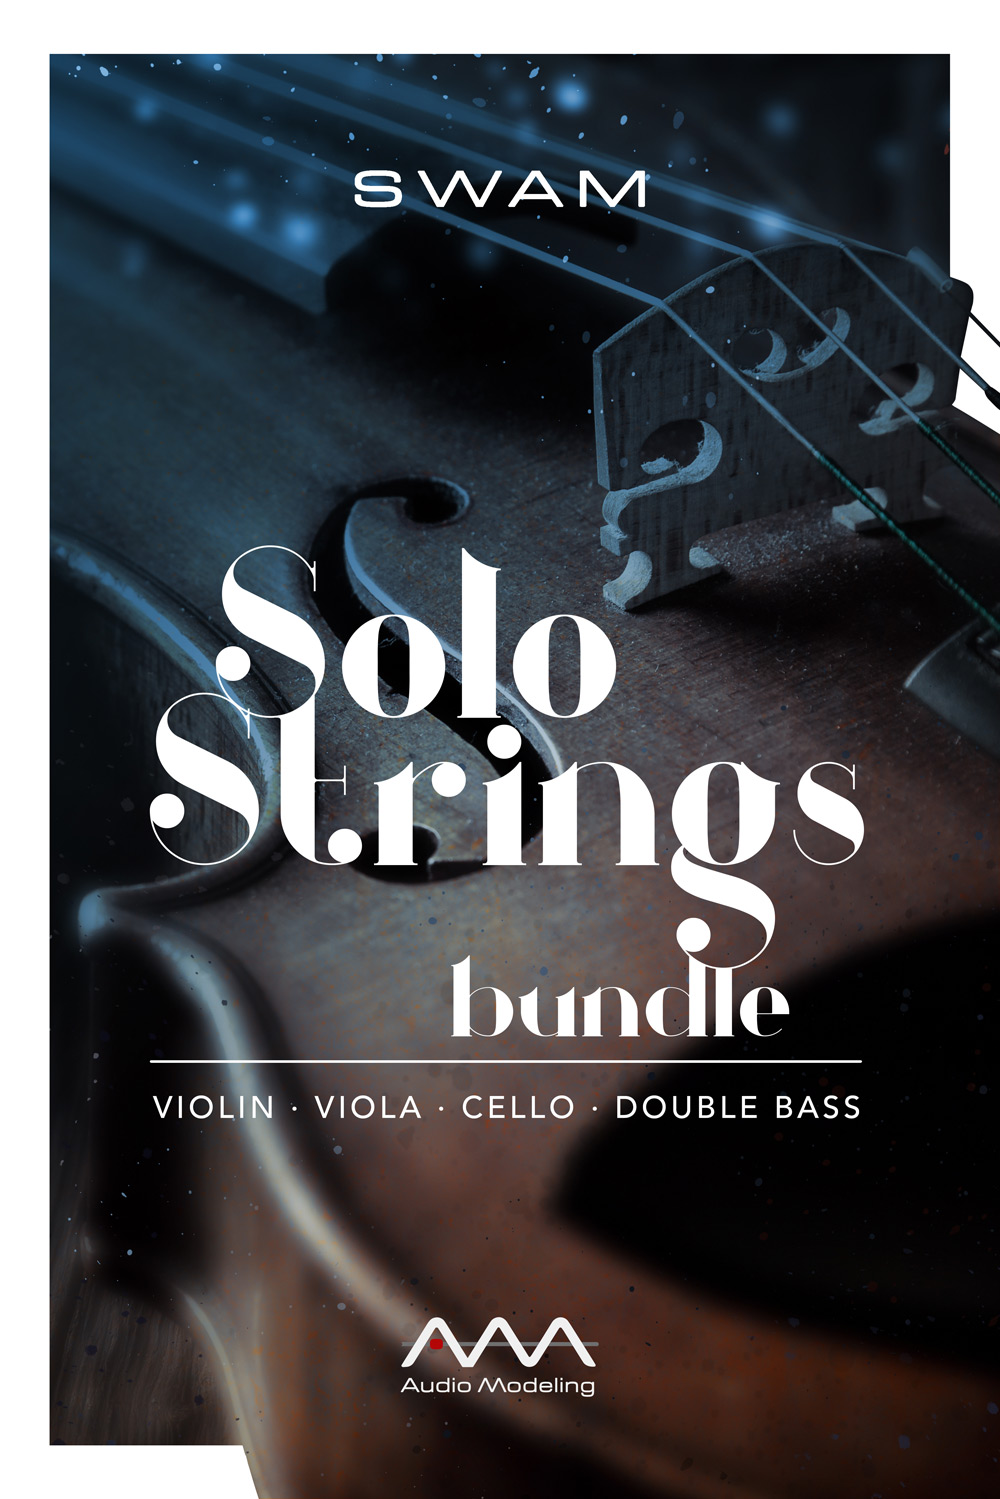 SWAM Solo Strings | Audio Modeling